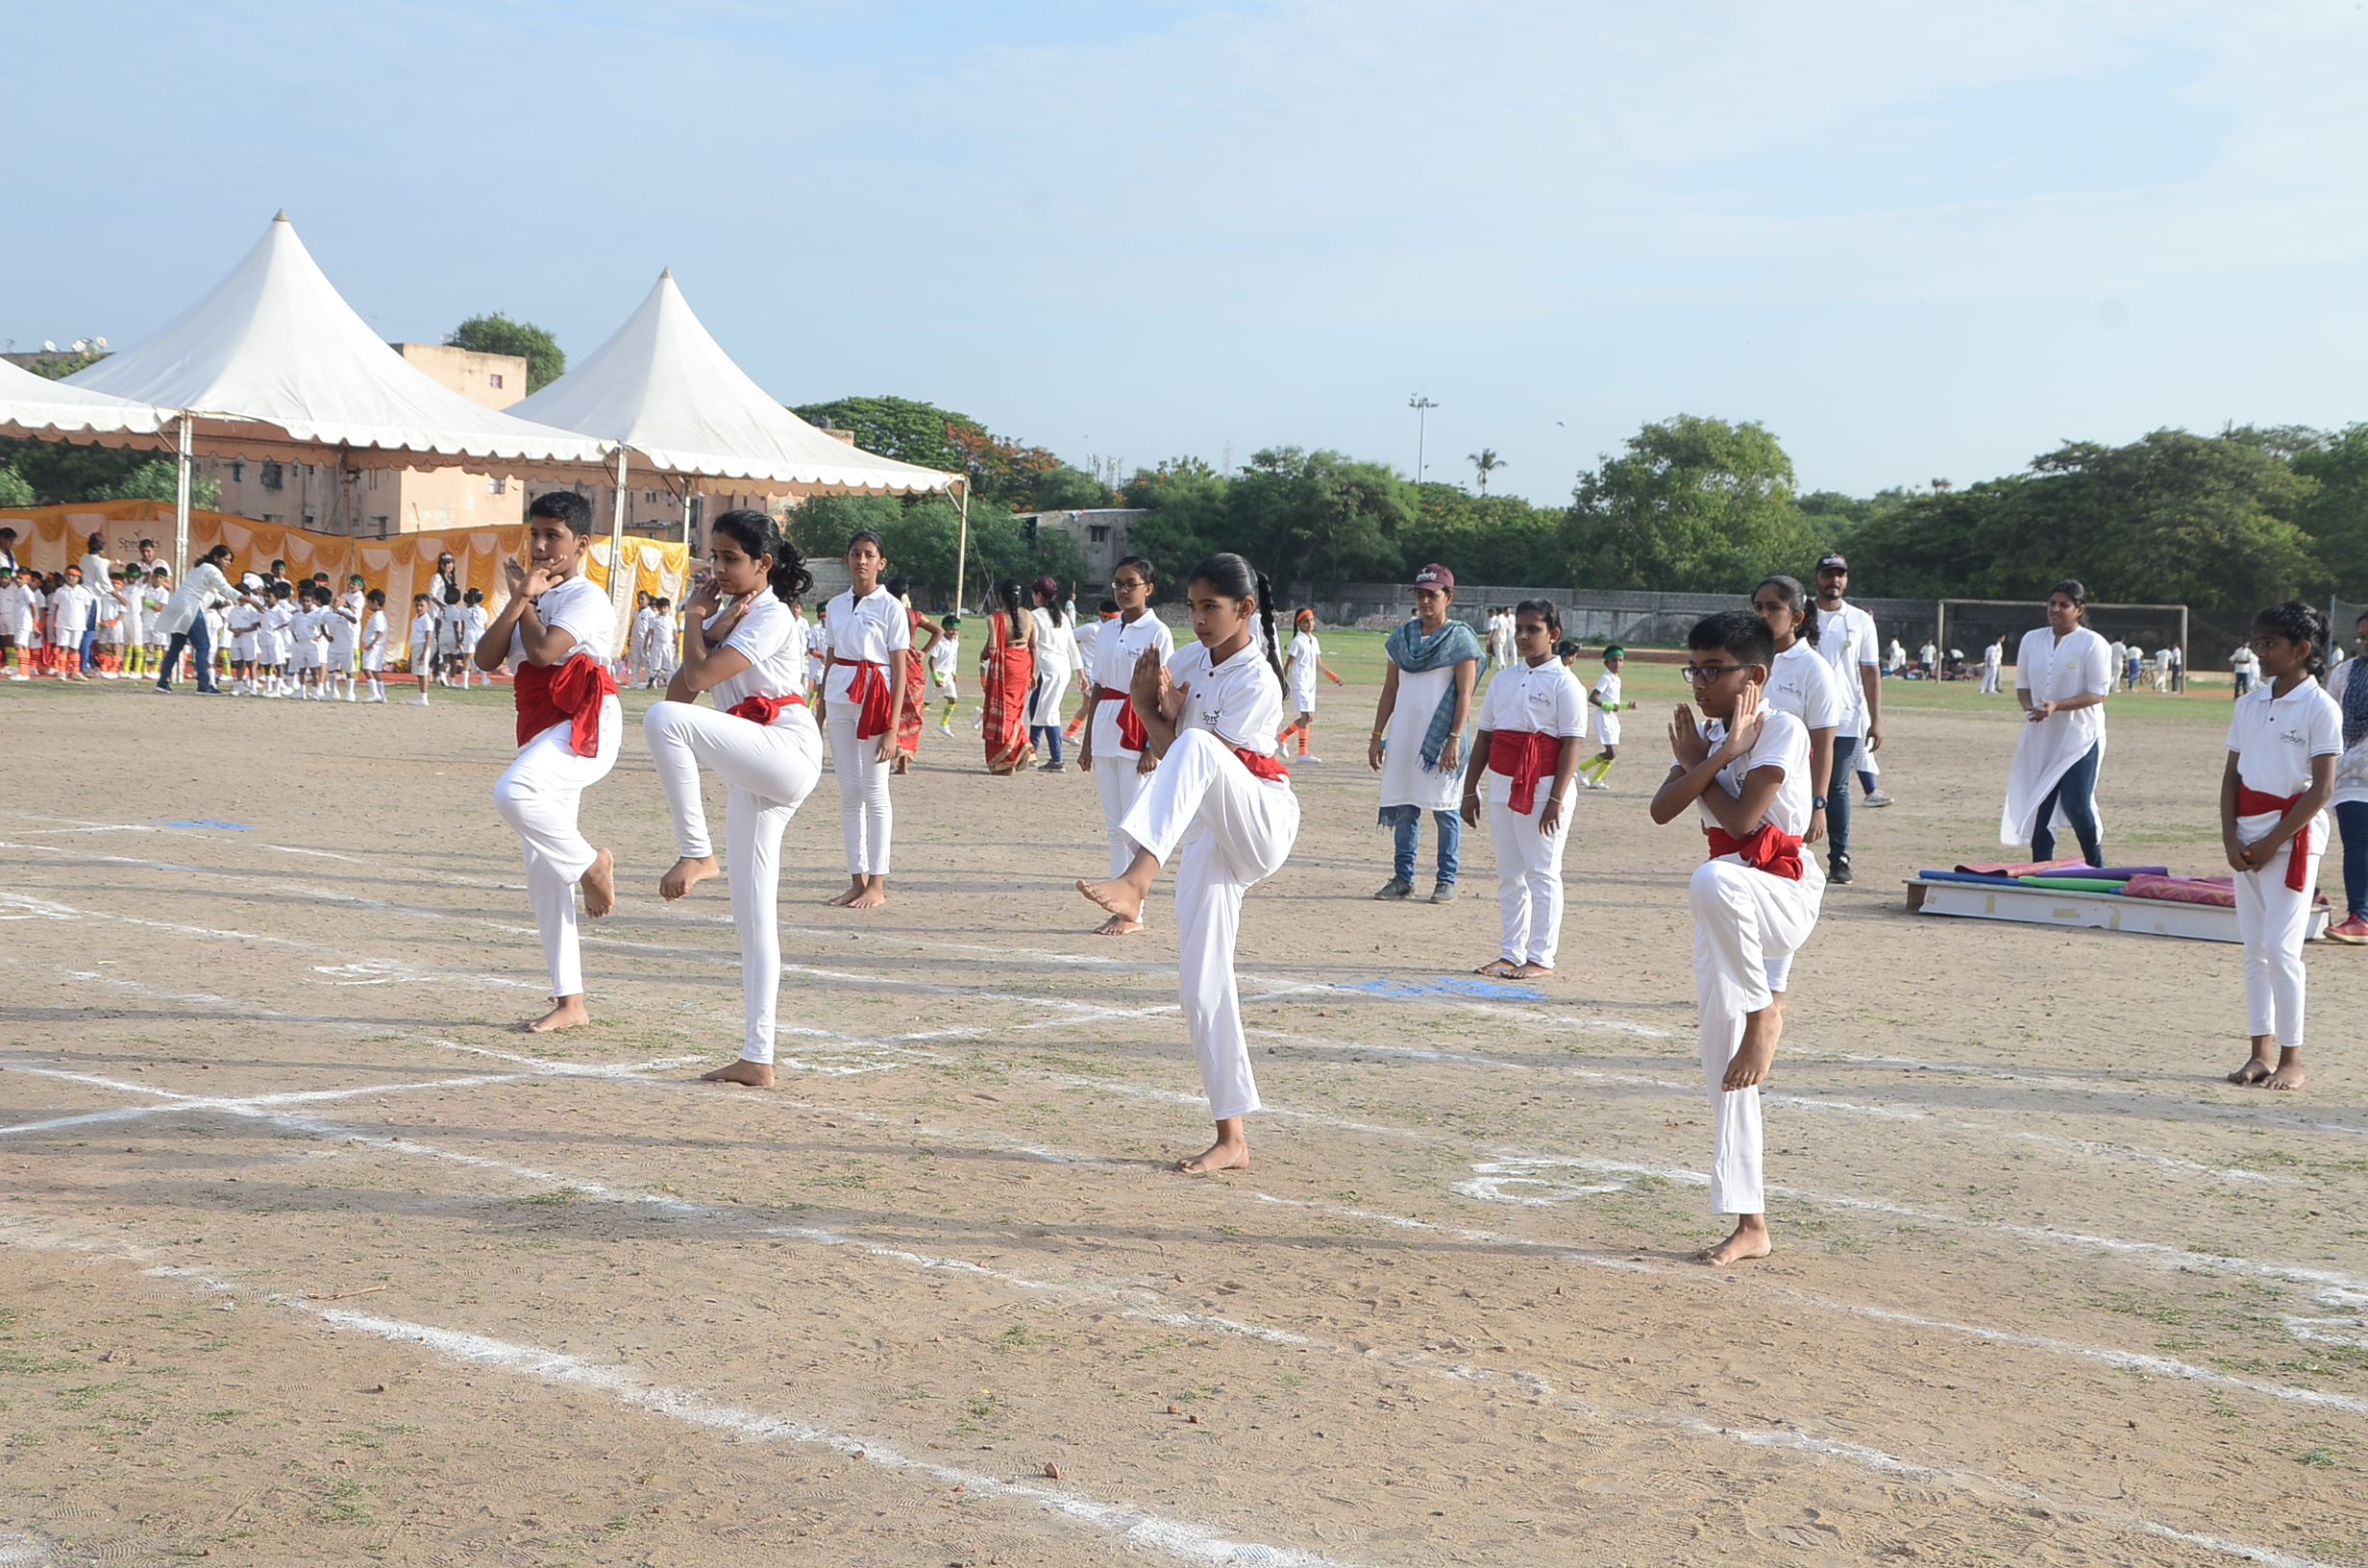 Beautiful display of Kalari movements